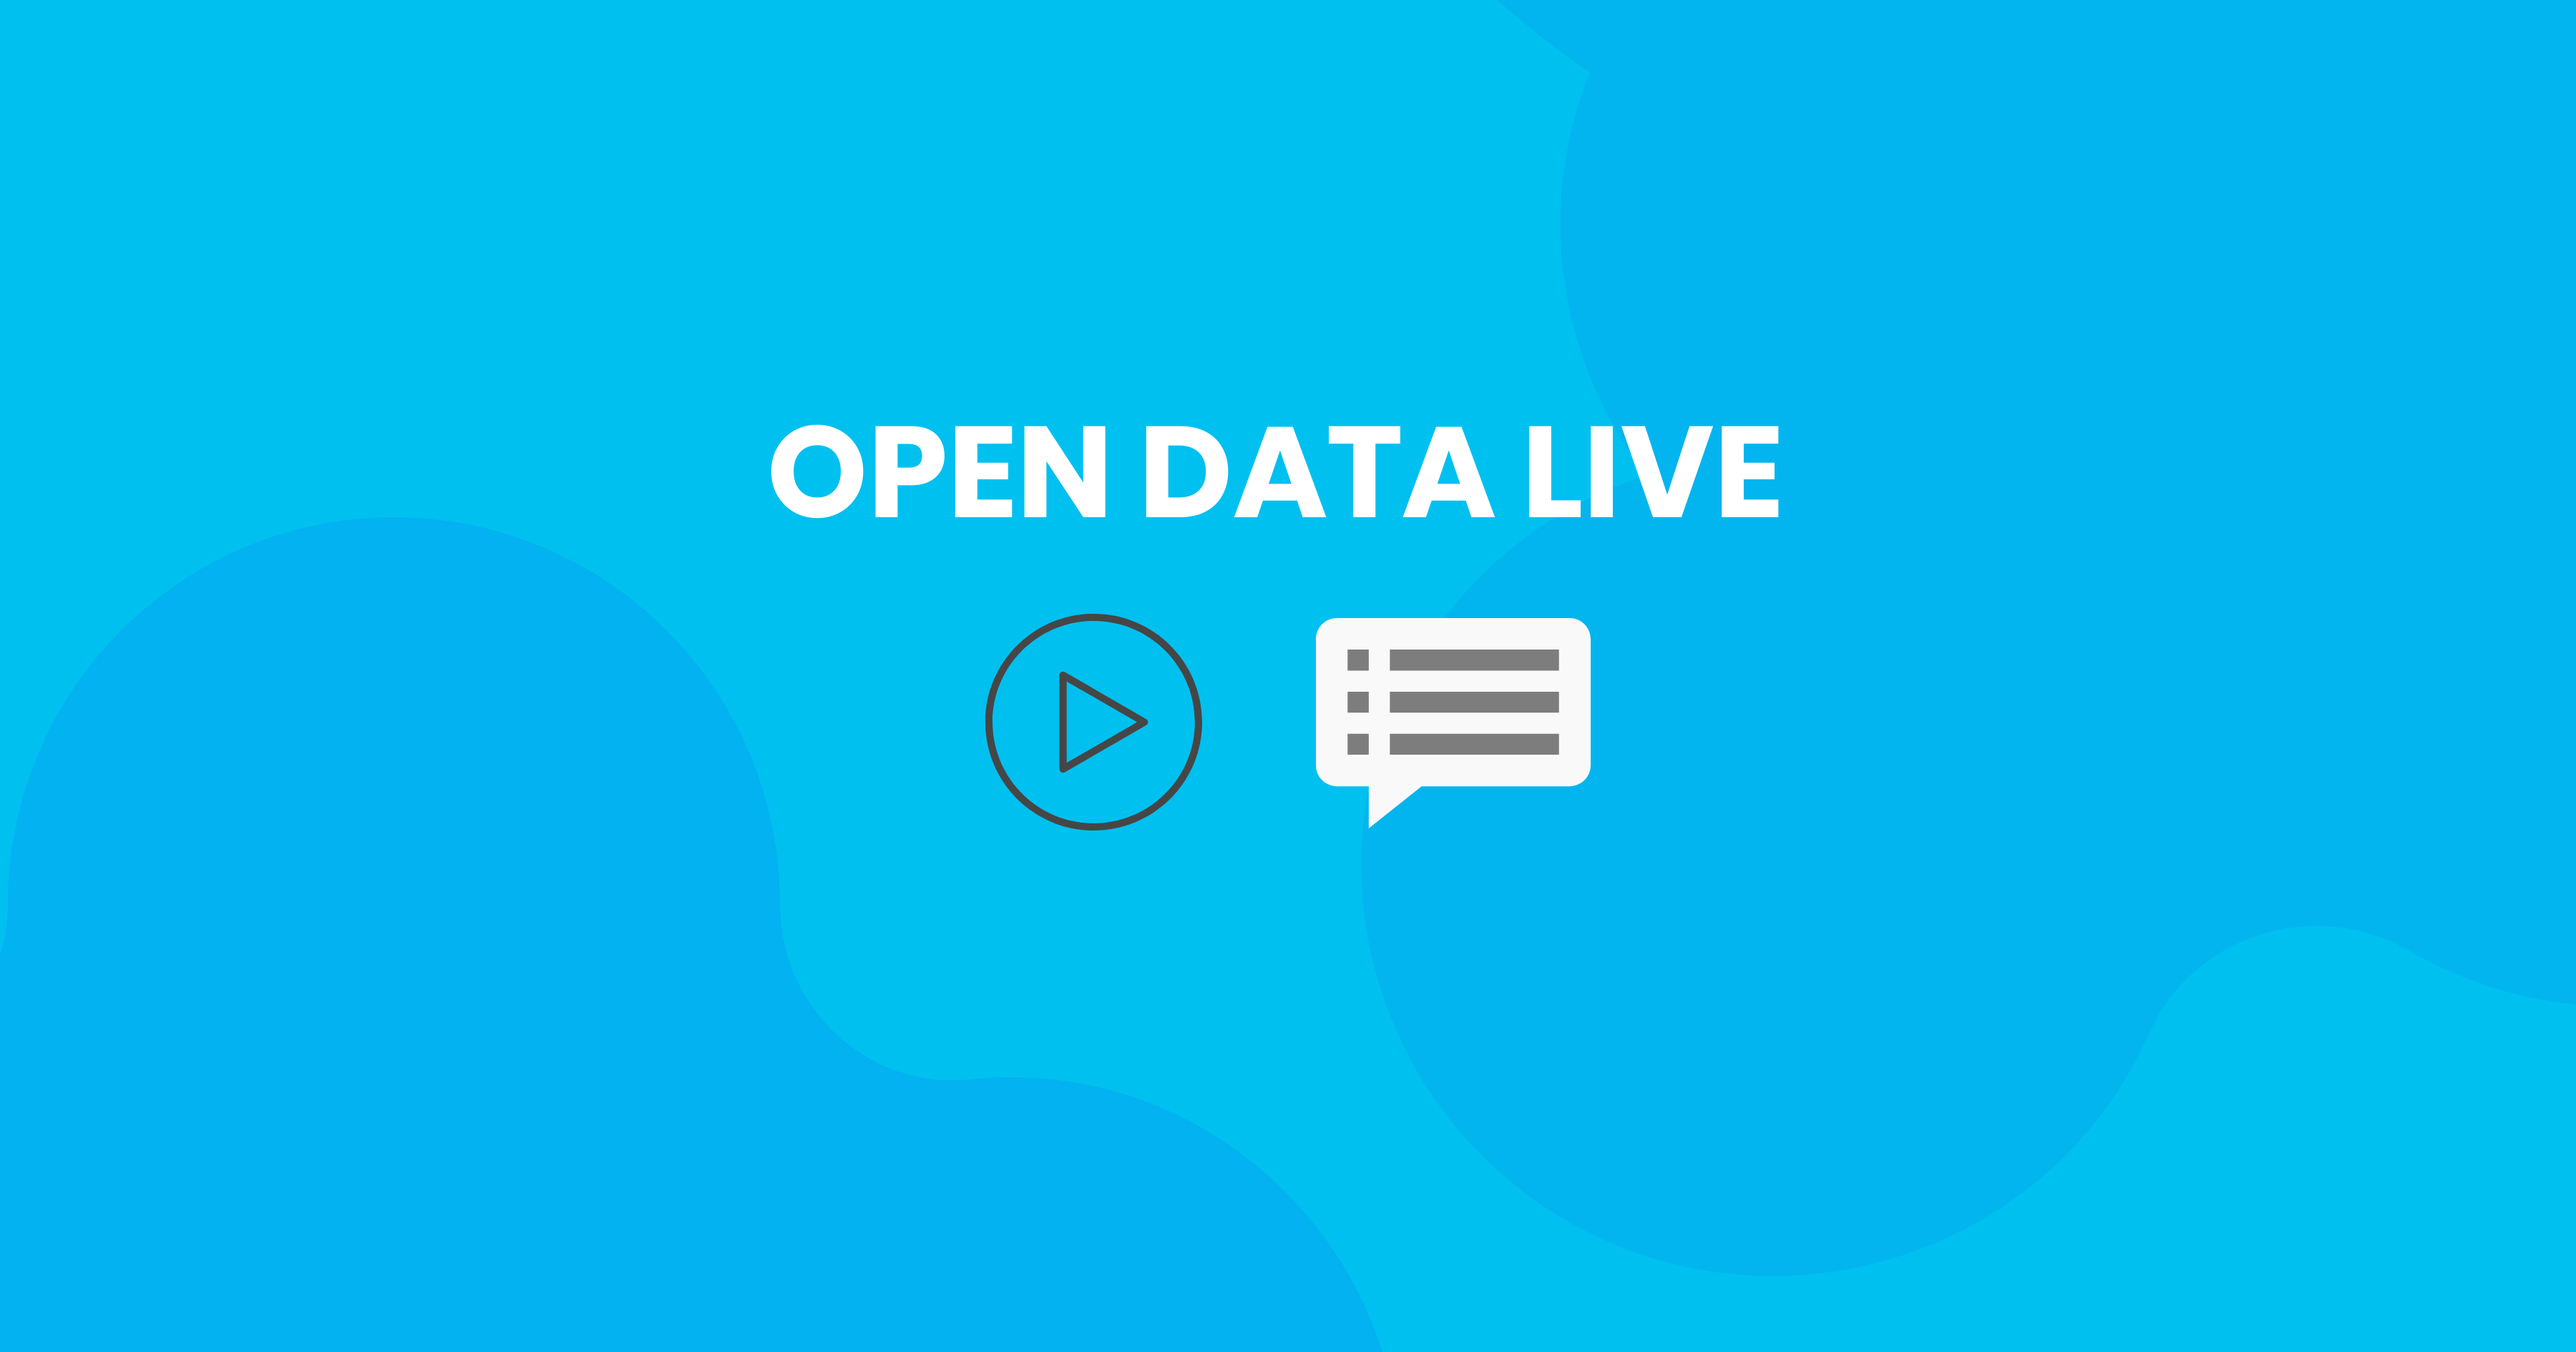 Open Data Live